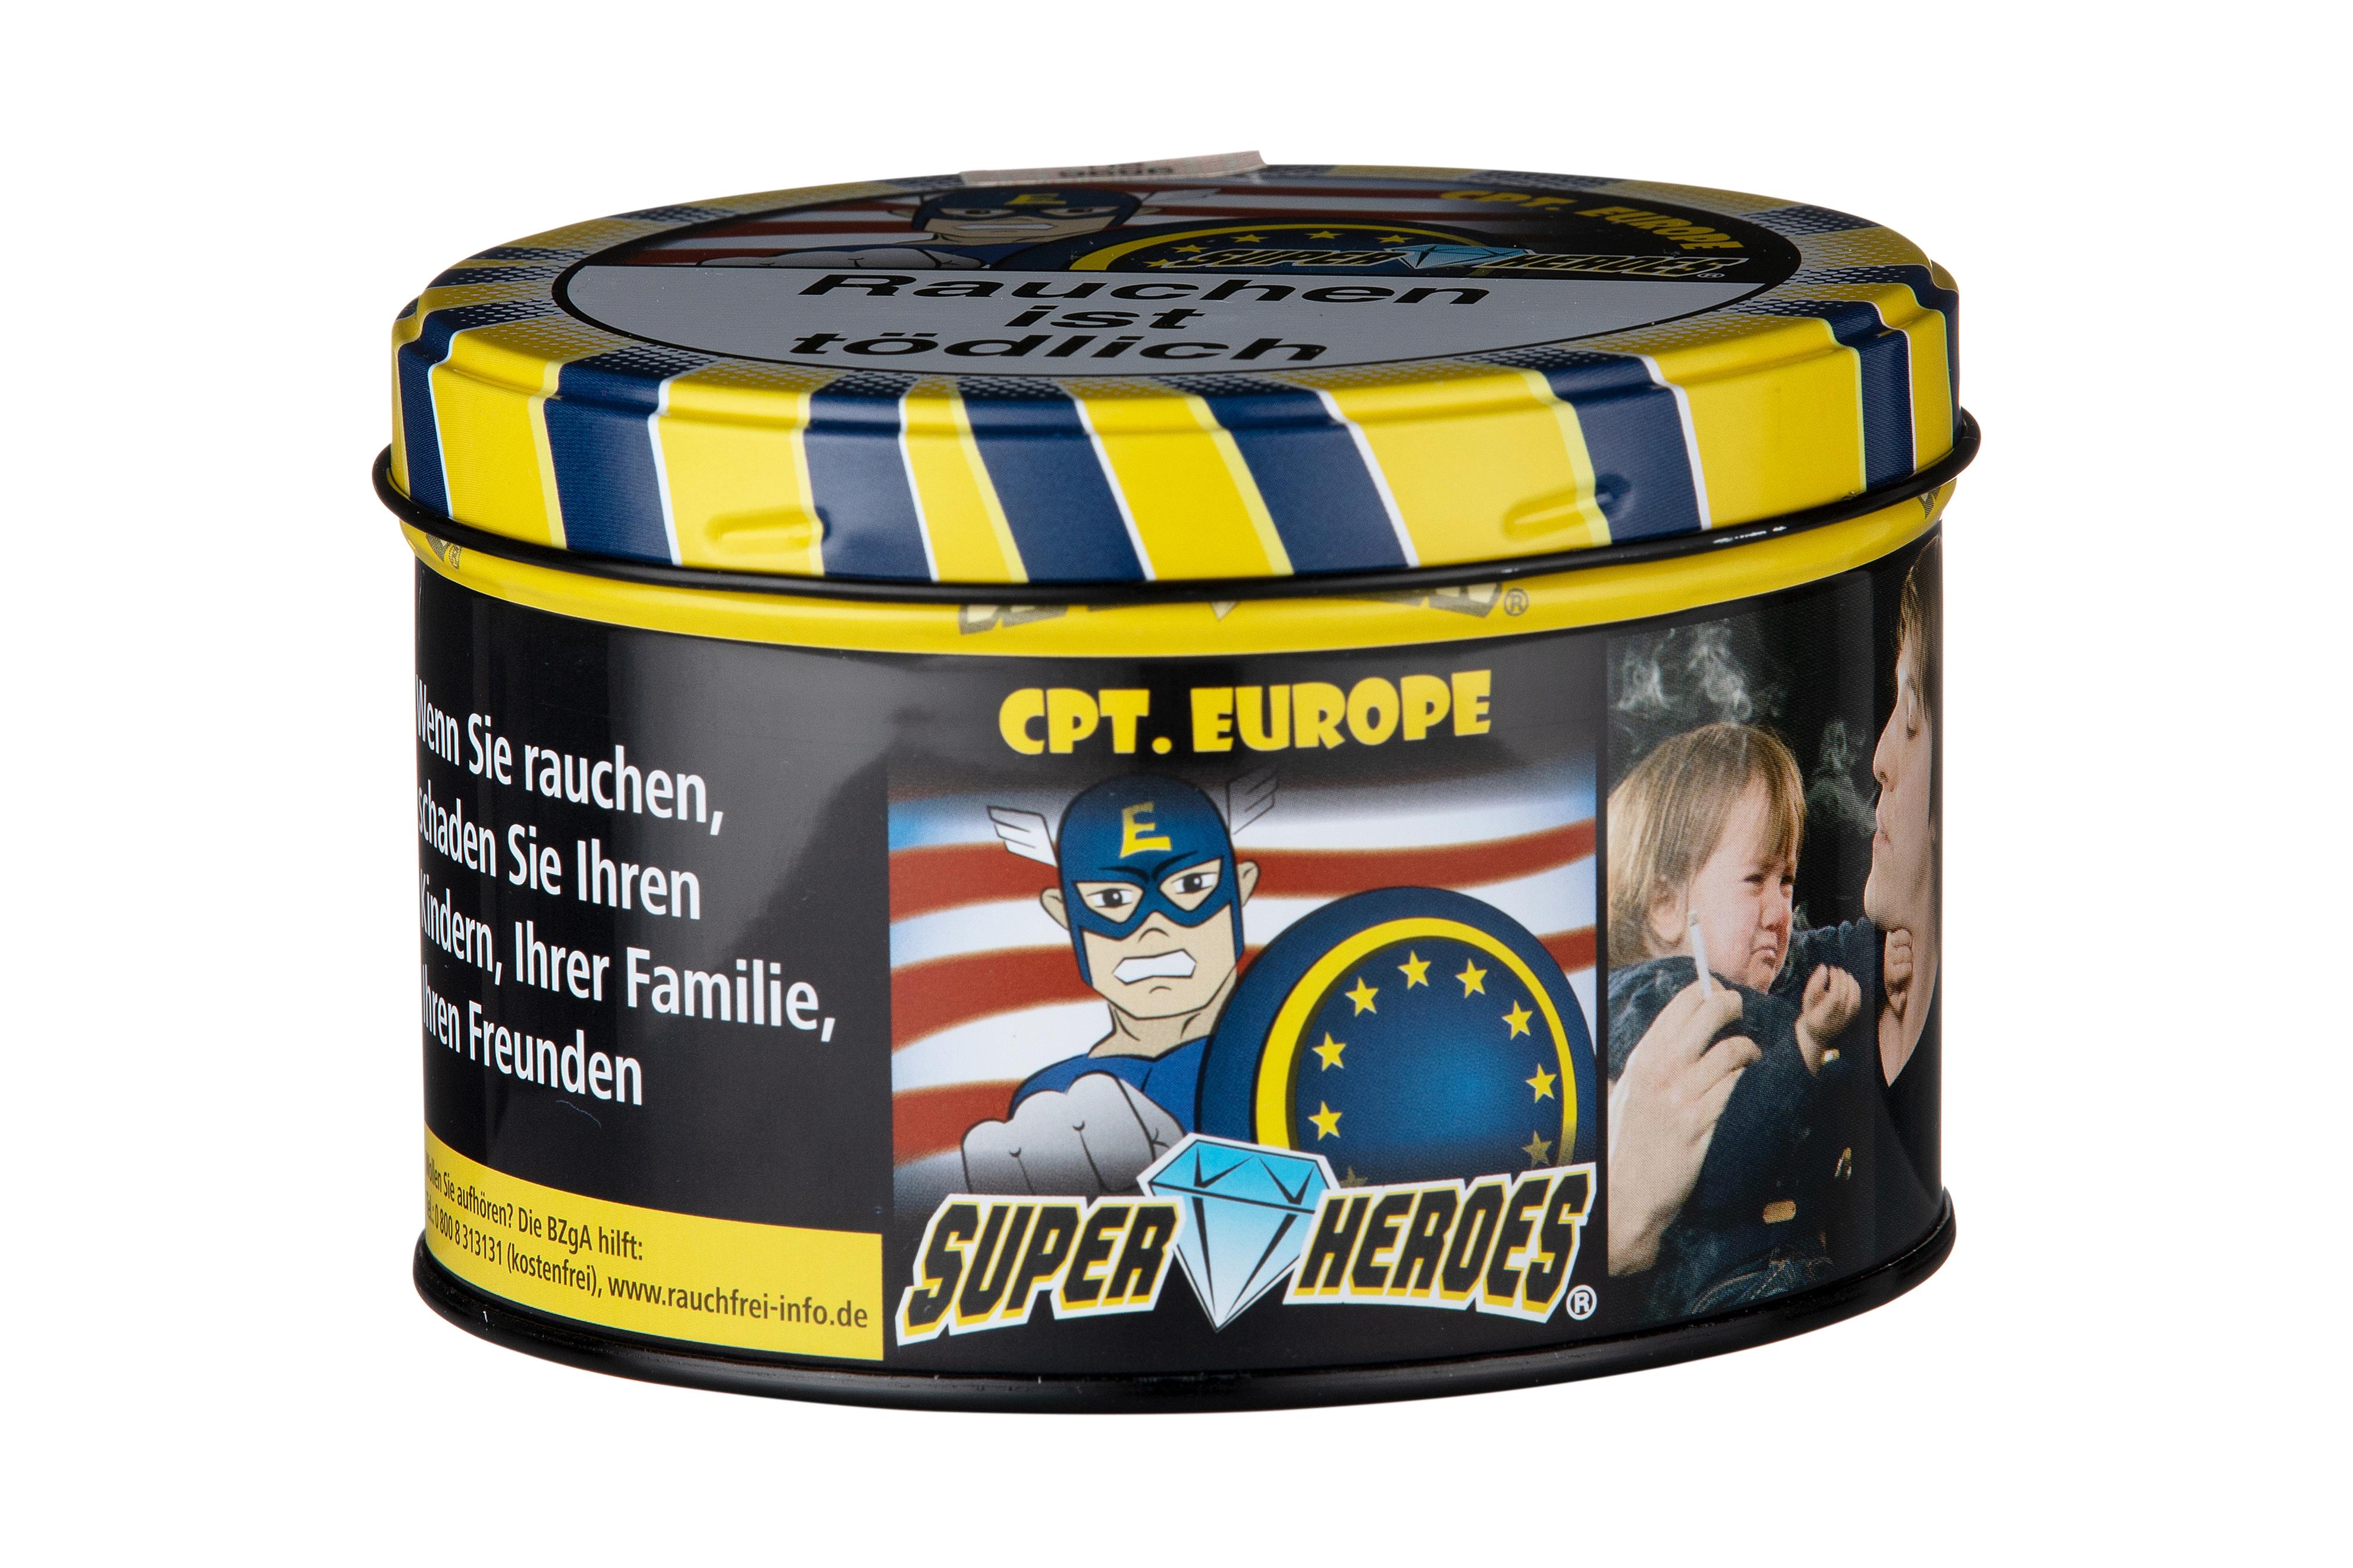 Super Heroes Wasserpfeifentabak Cpt. Europe